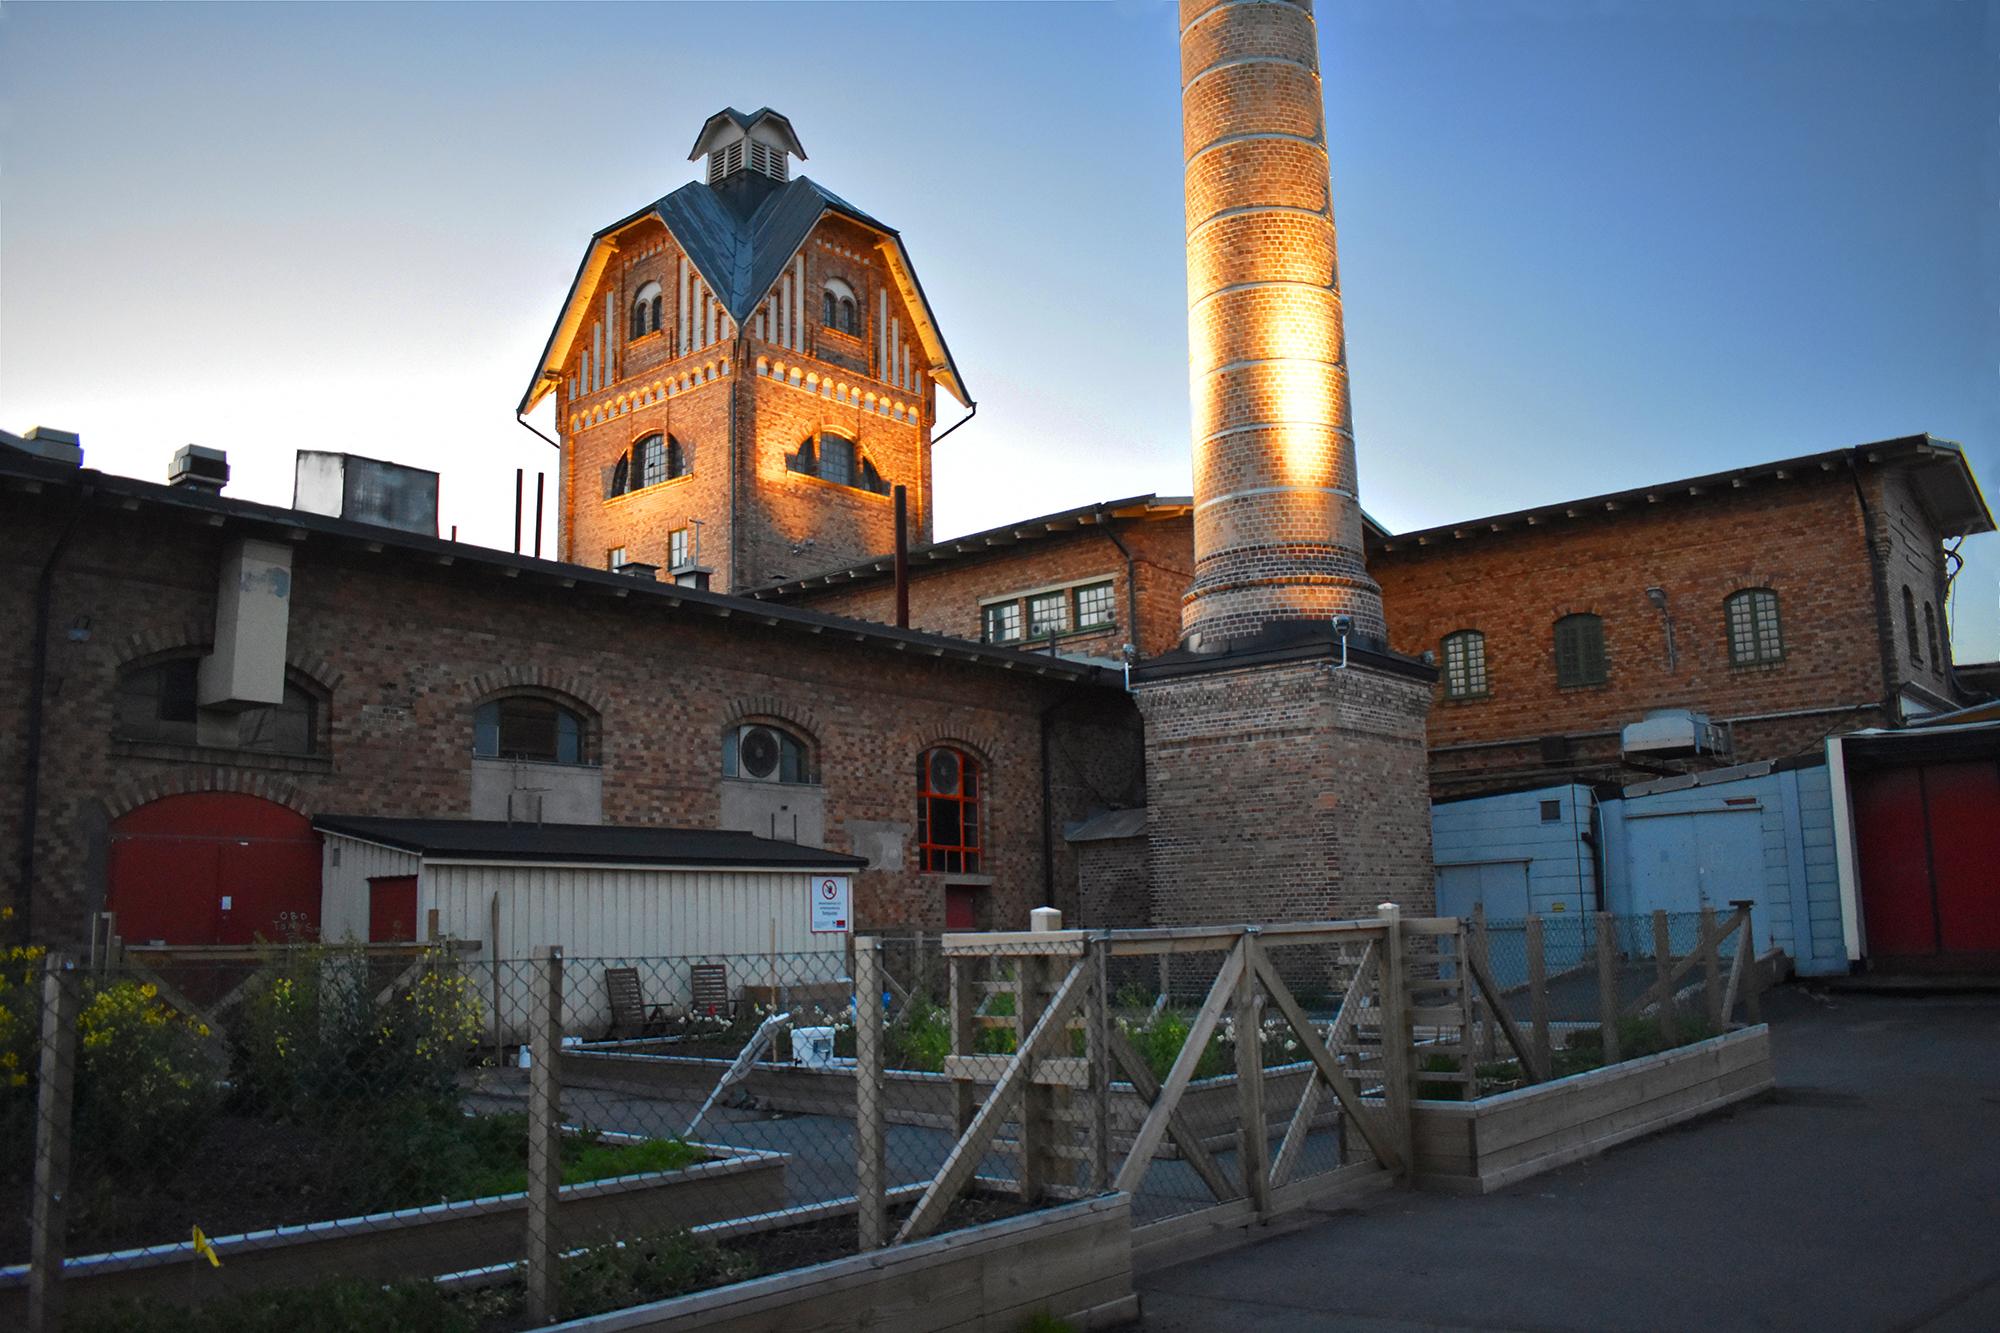 Belyst skorsten och torn i Slakthuset